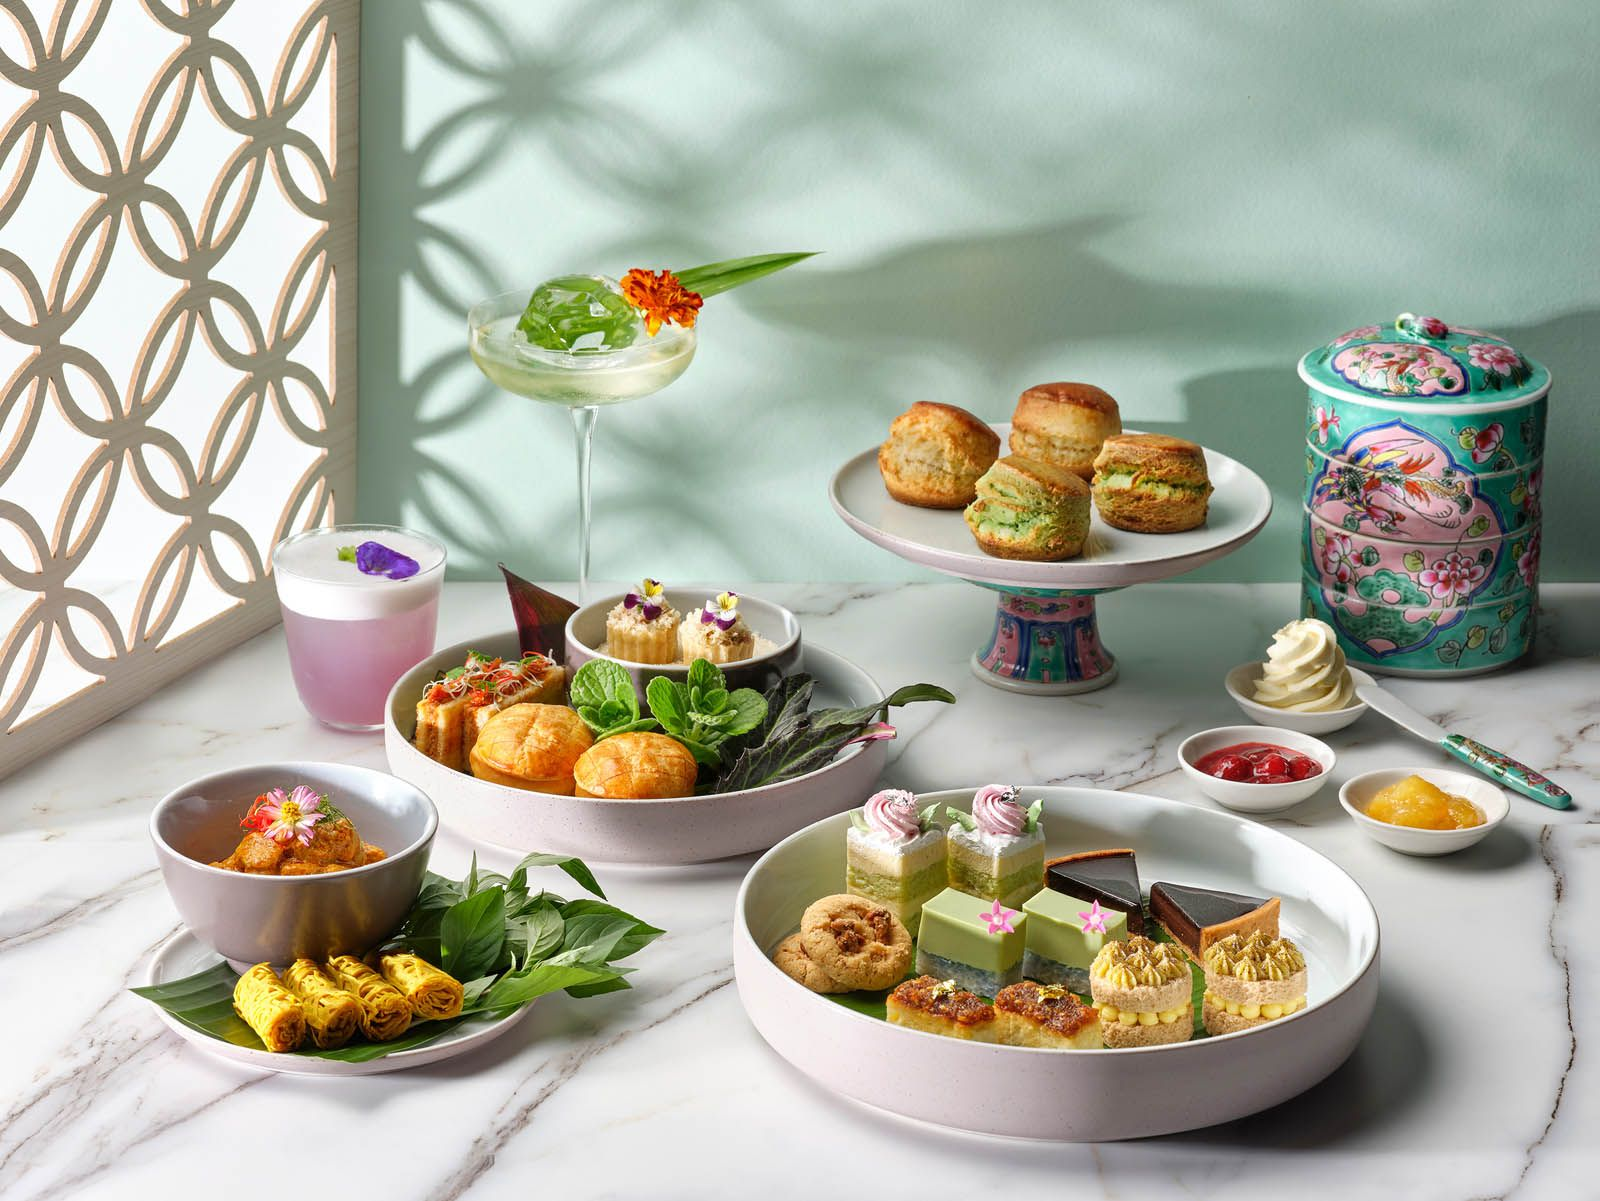 Peranakan Weekend Afternoon Tea Spread